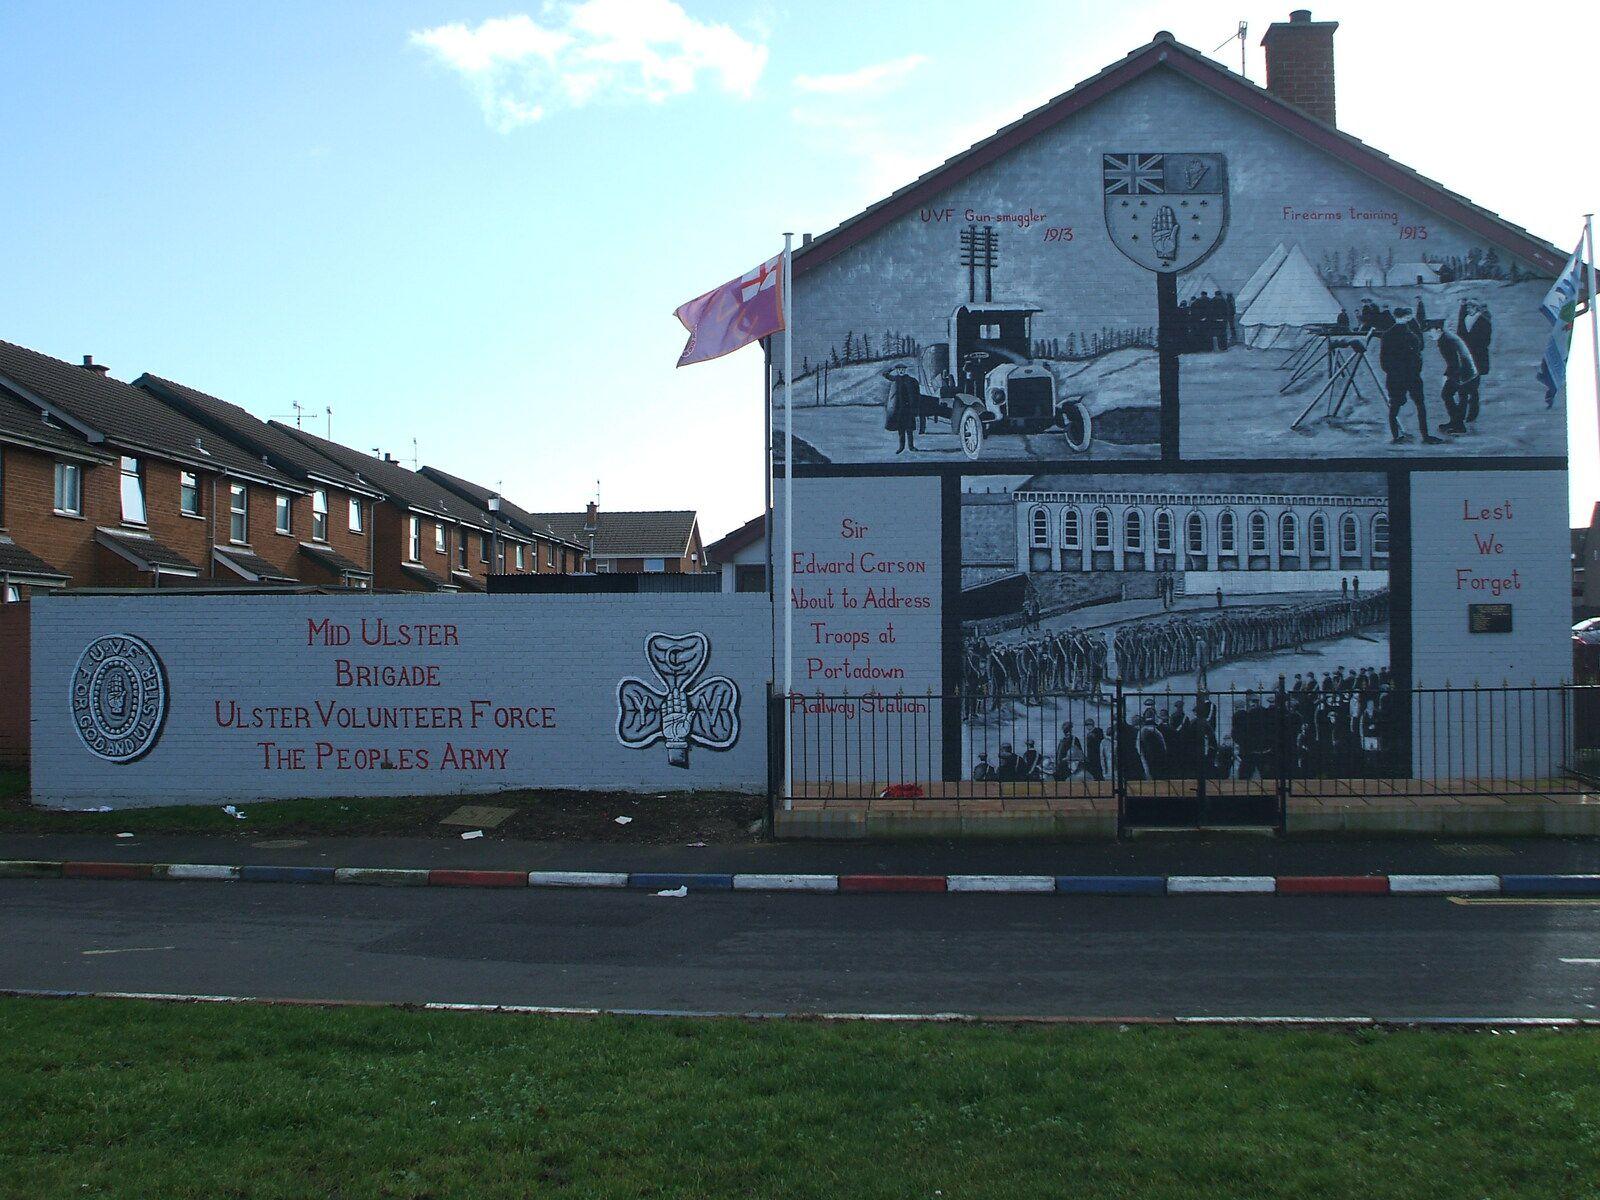 846) Westland Road, Portadown Loyalist